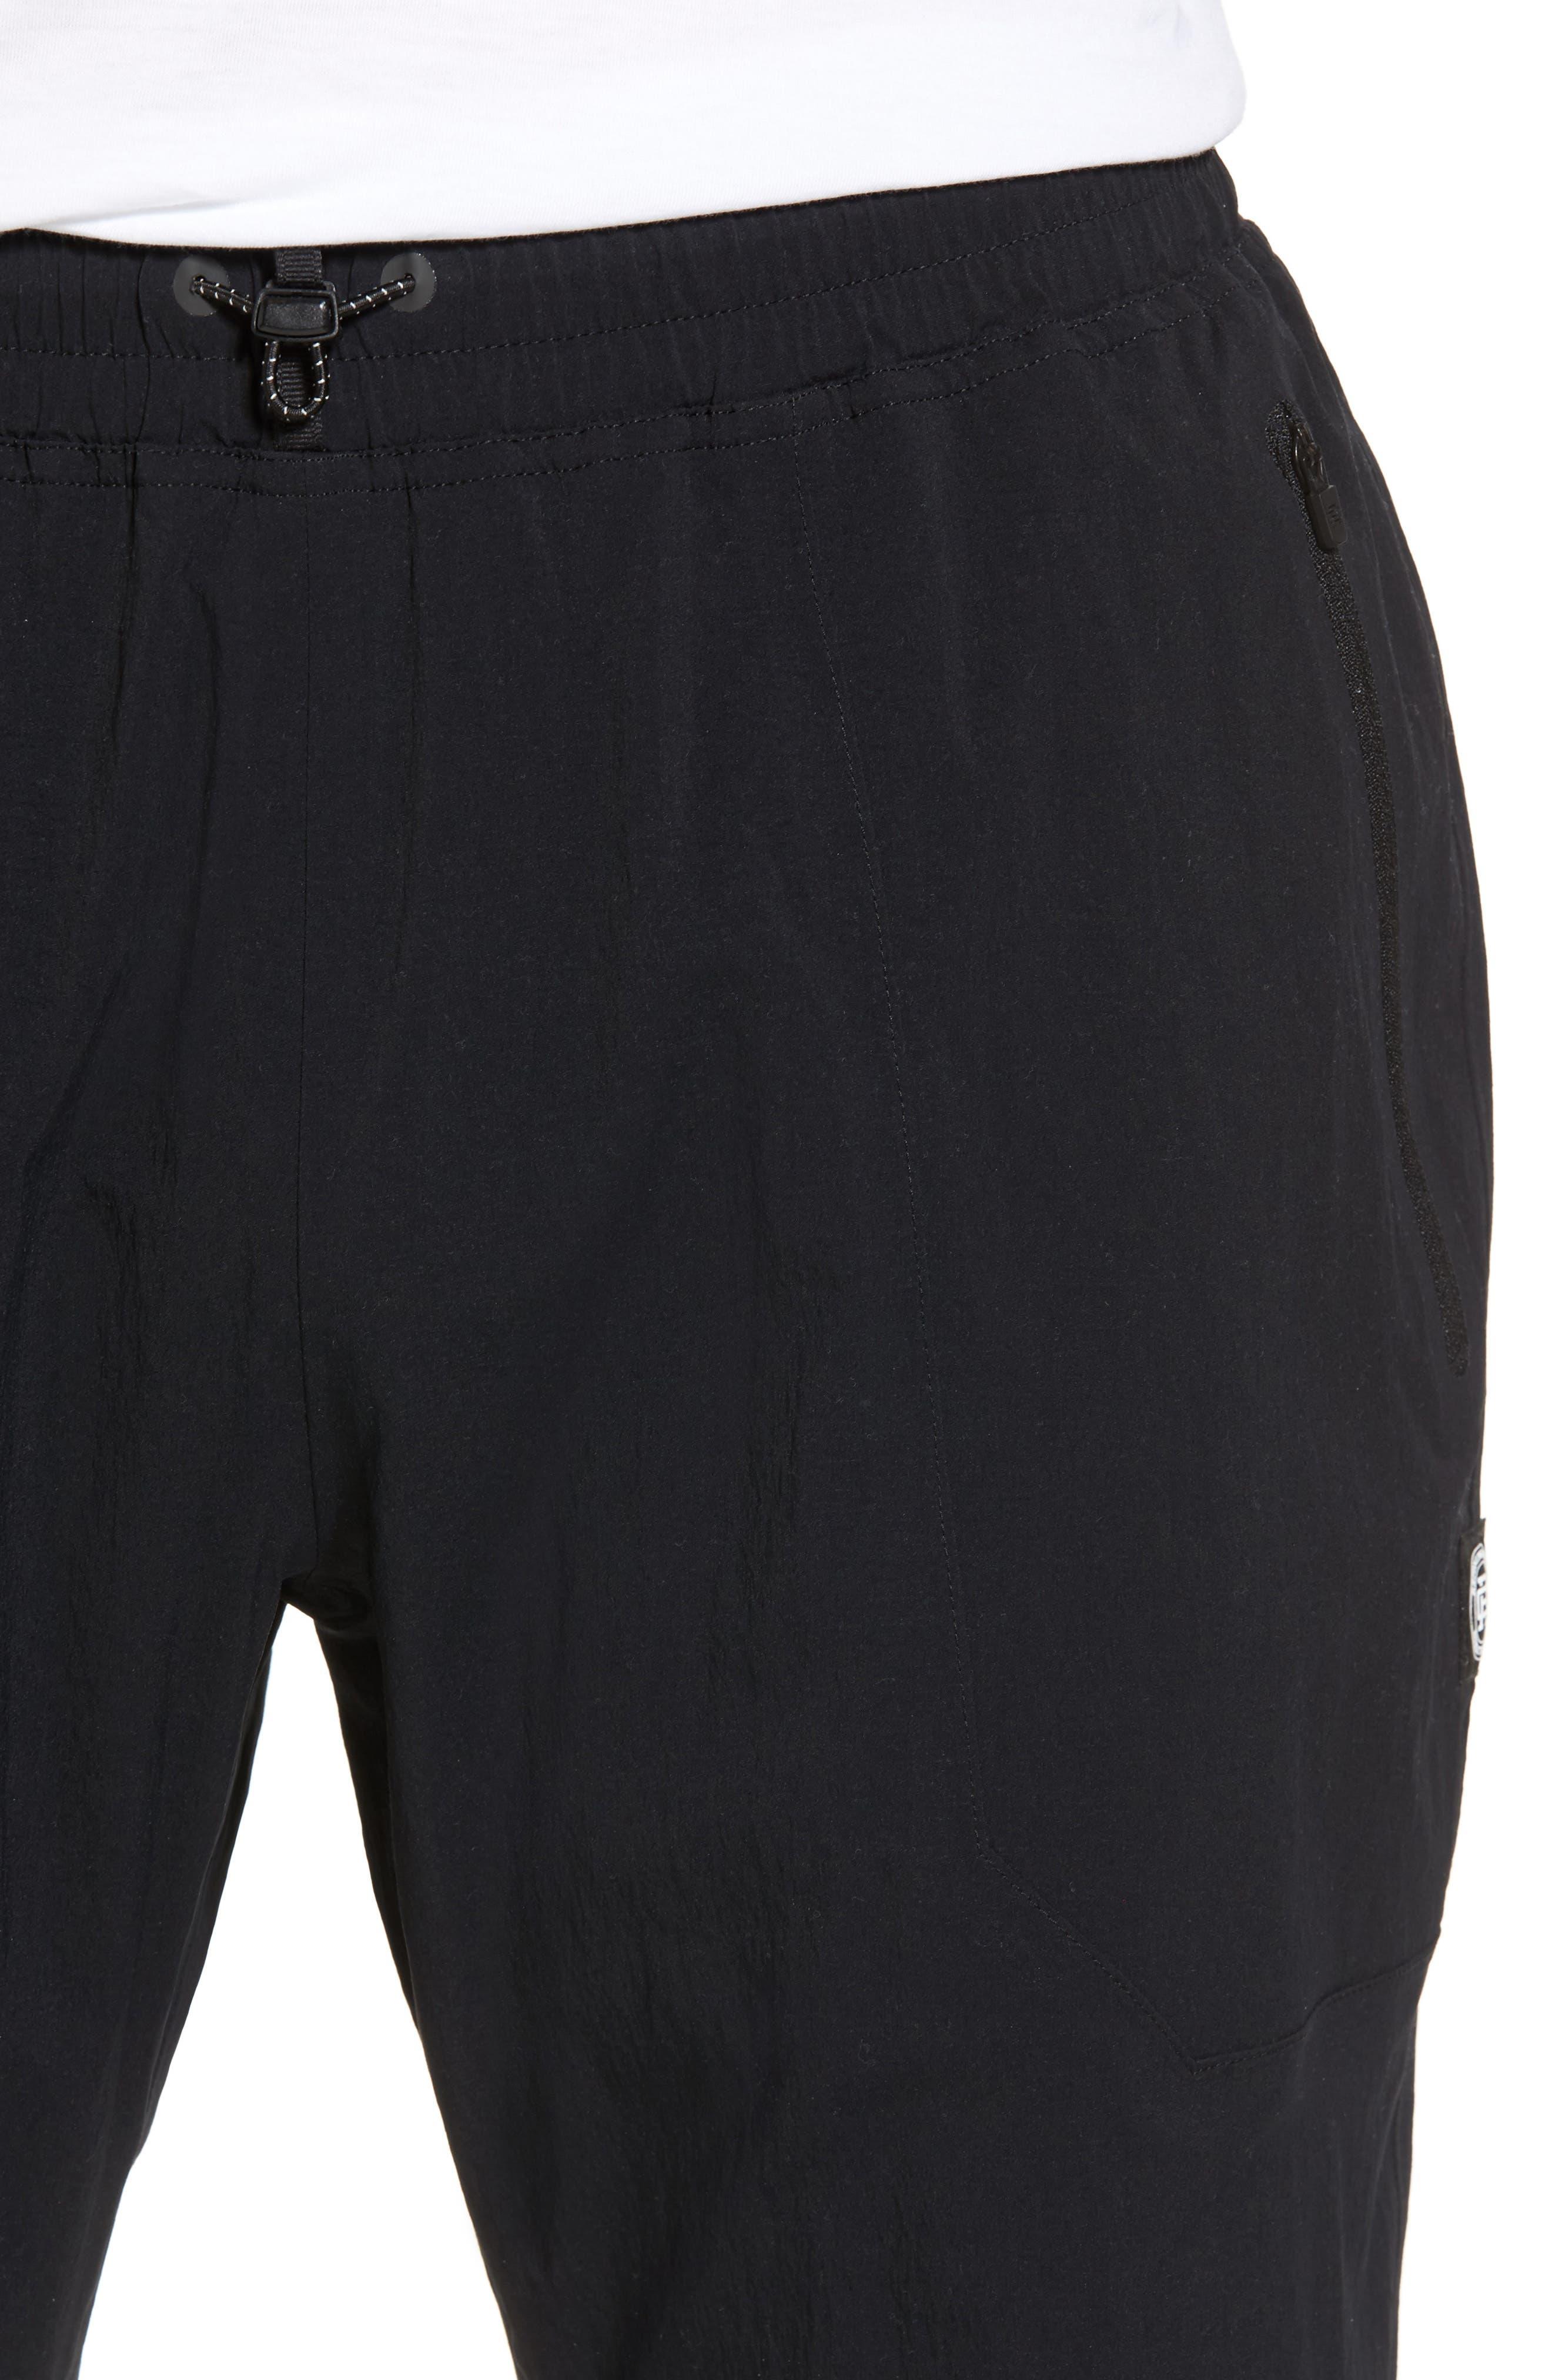 N279 Sweatpants,                             Alternate thumbnail 4, color,                             001